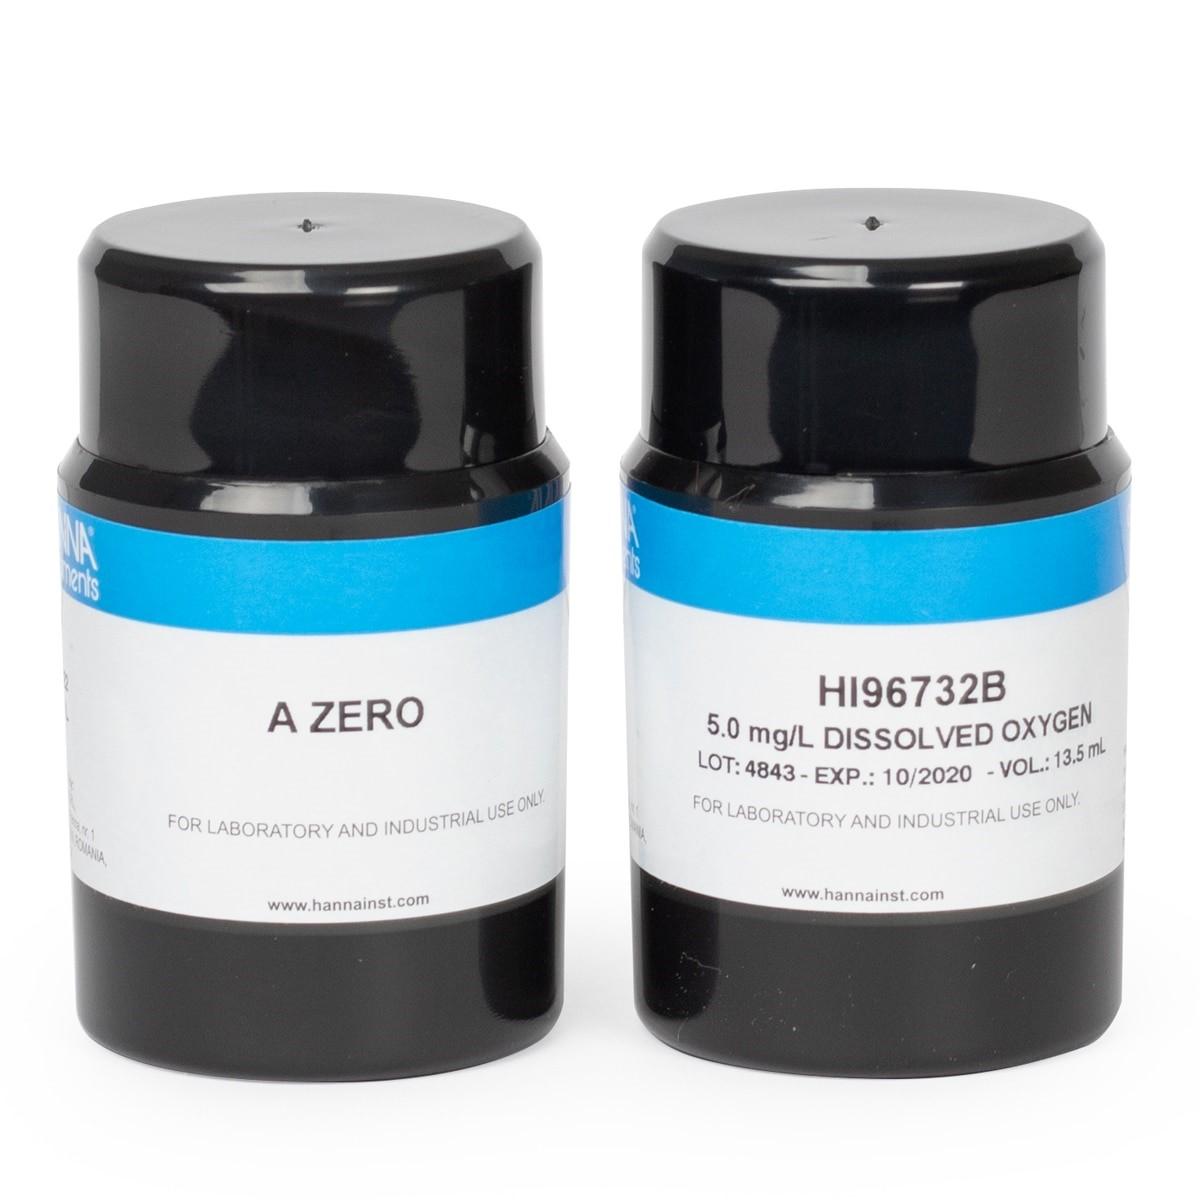 Dissolved Oxygen CAL Check™ Standards - HI96732-11